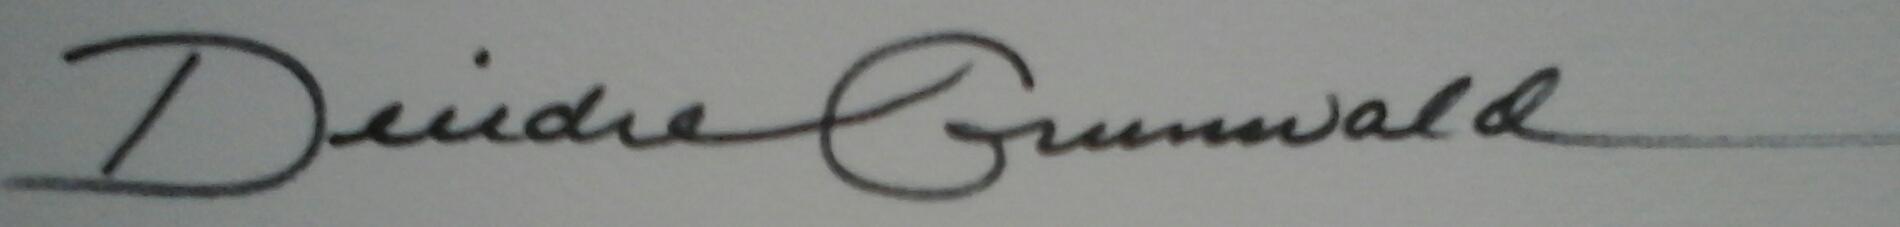 Deirdre Grunwald Signature